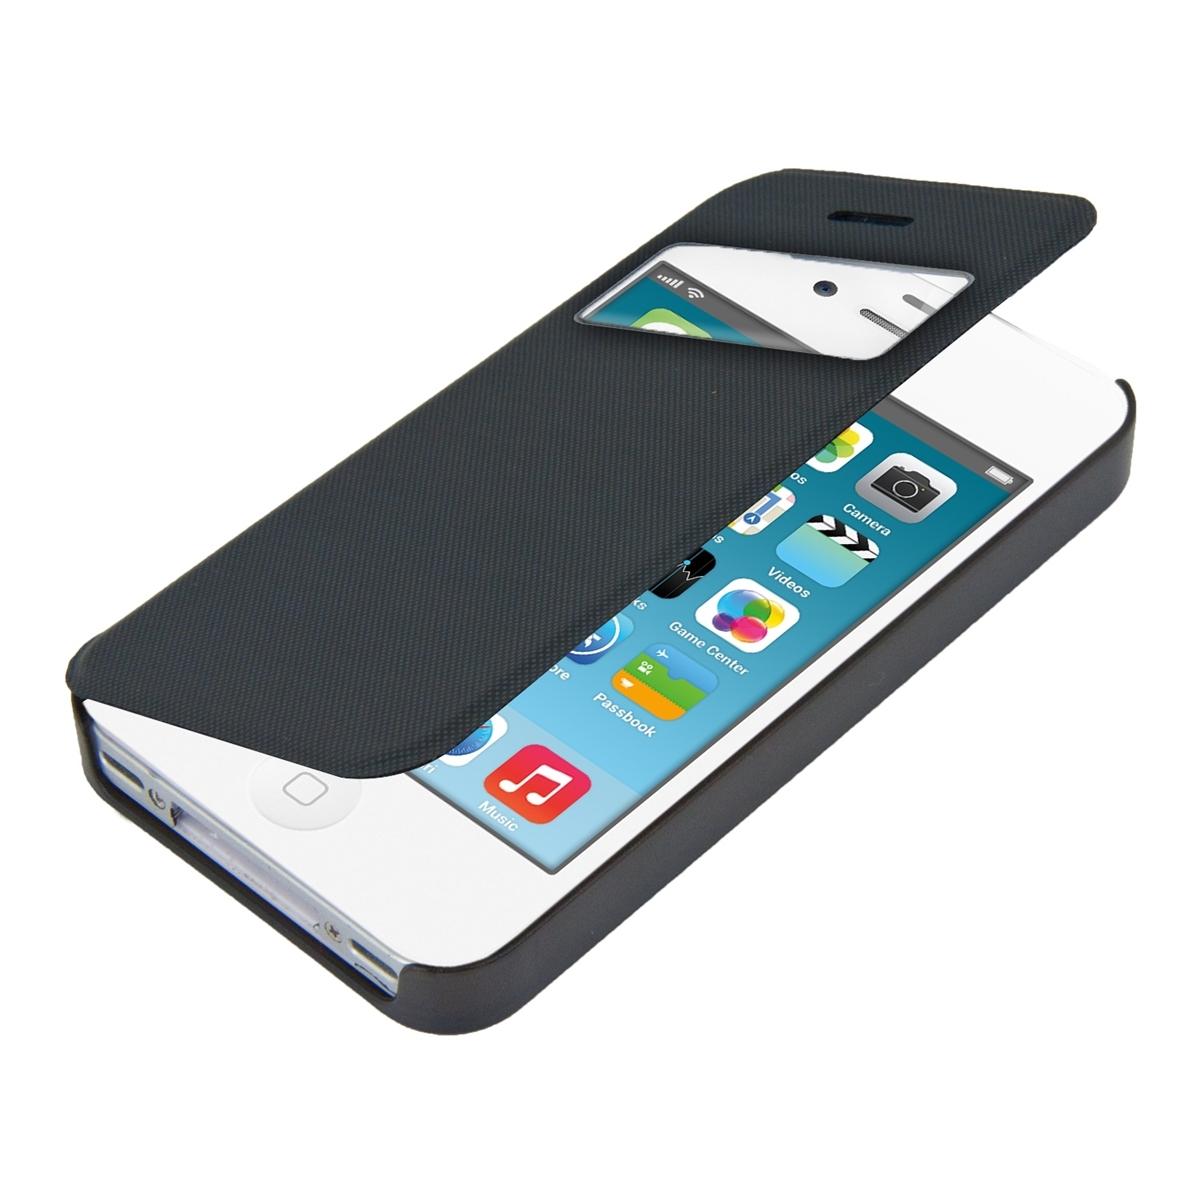 iPhone mobile phone cases iphone 4s : ... Schutz Hu00fclle fu00fcr Apple Iphone 4 4S Schwarz Case Tasche Etui : eBay